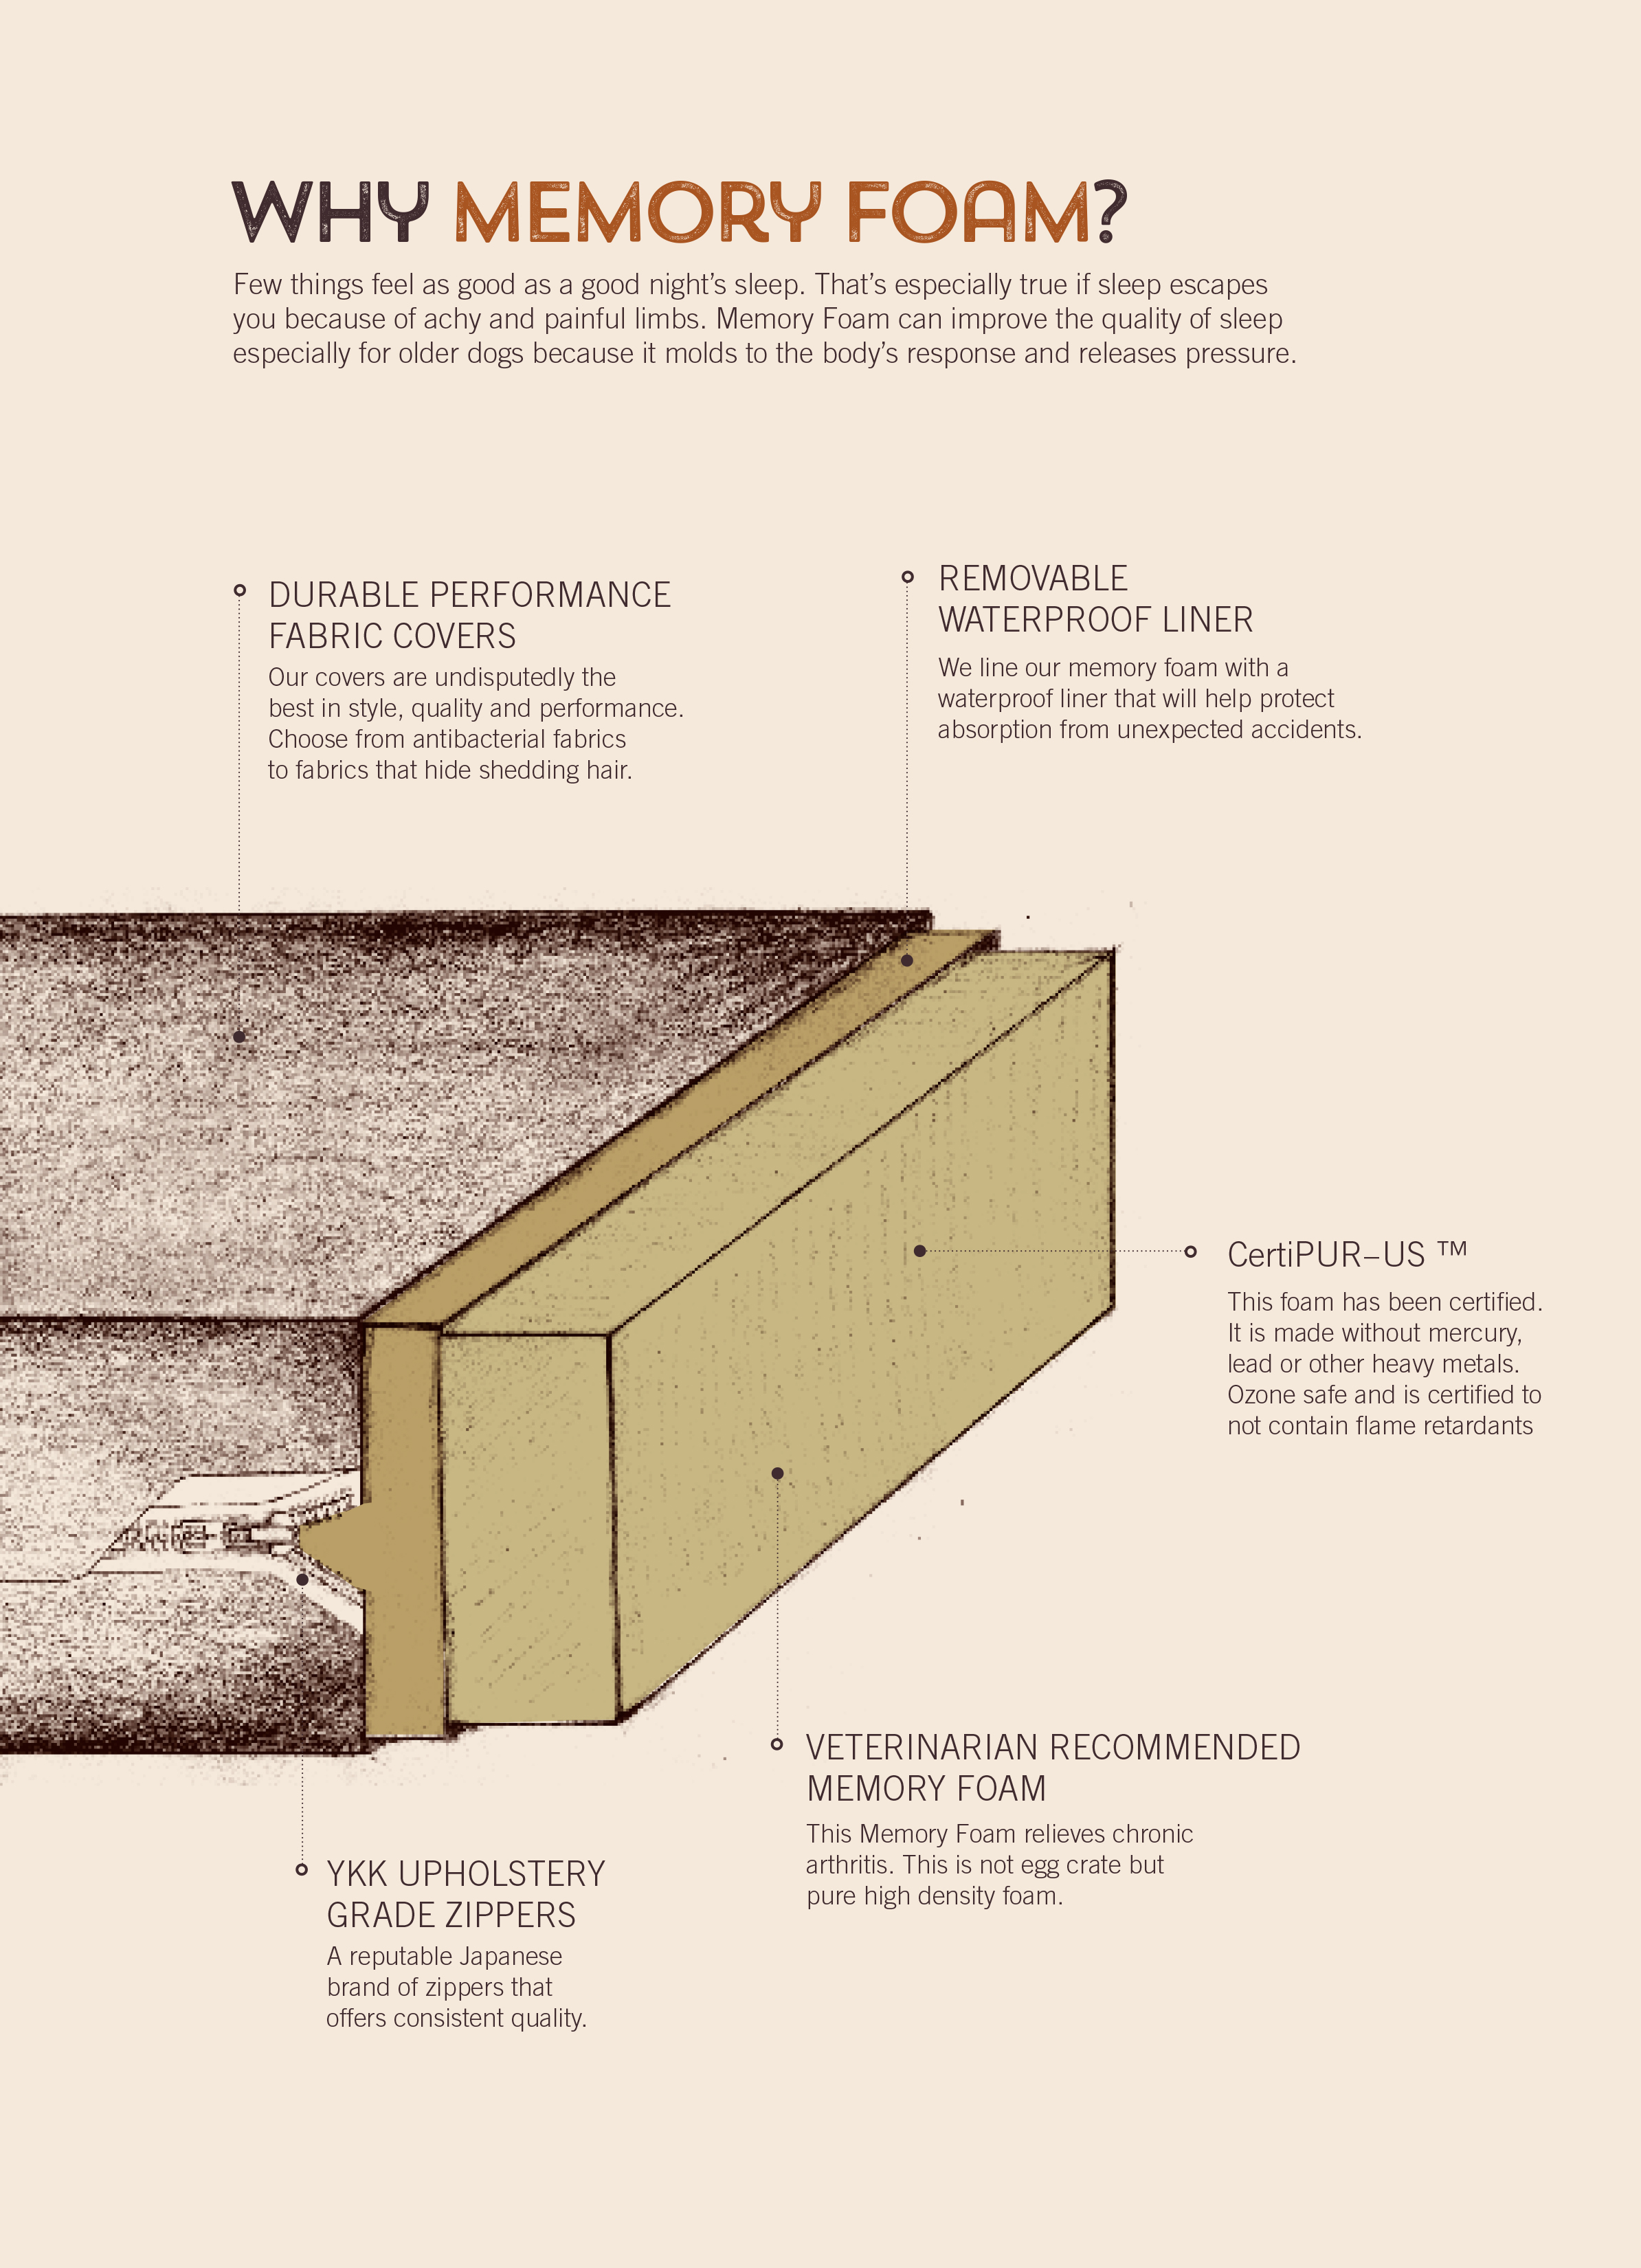 memory-foam-illustration-1-.jpg